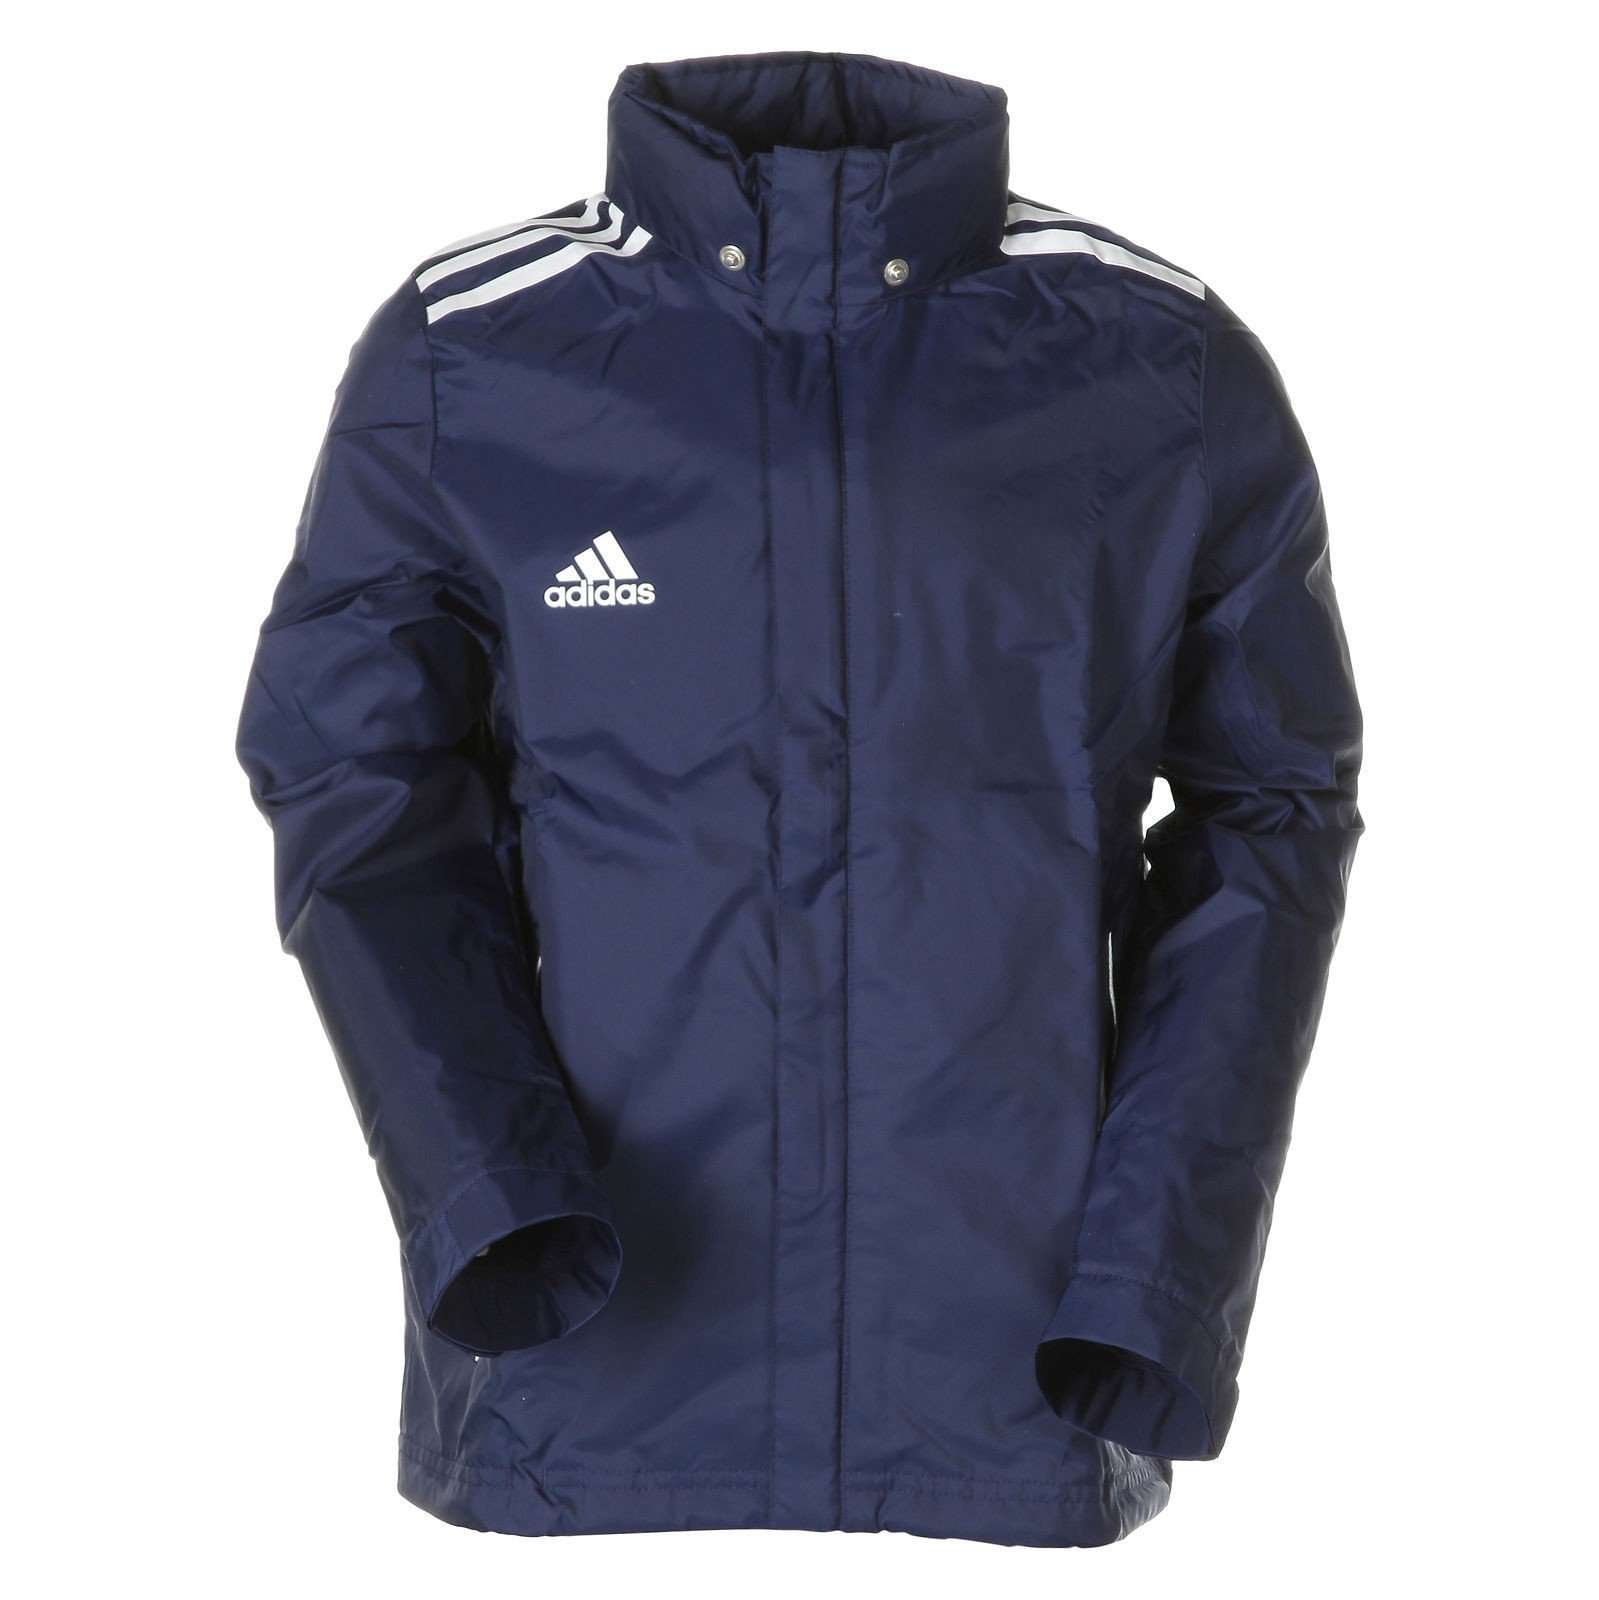 Adidas Junior Navy Rain Jacket